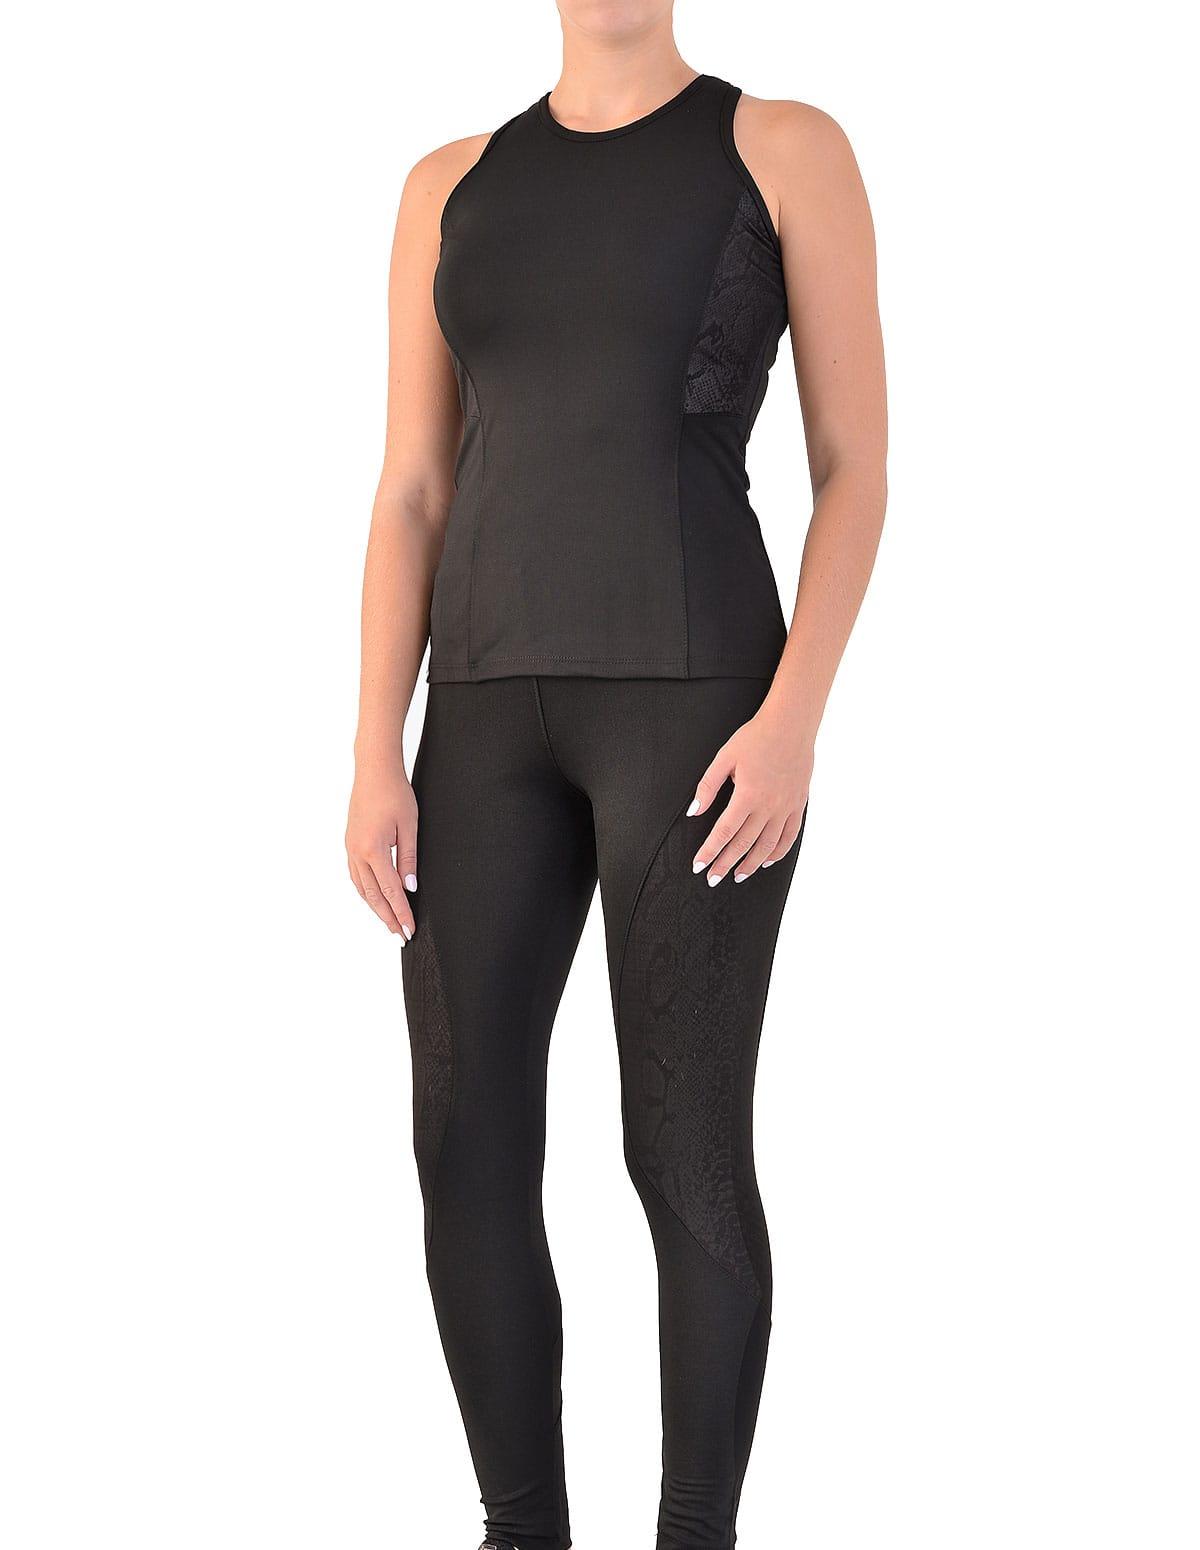 b2a2b3200d9b Γυναικείο αθλητικό σετ μπλουζάκι και κολάν σε μαύρο χρώμα - vactive.gr